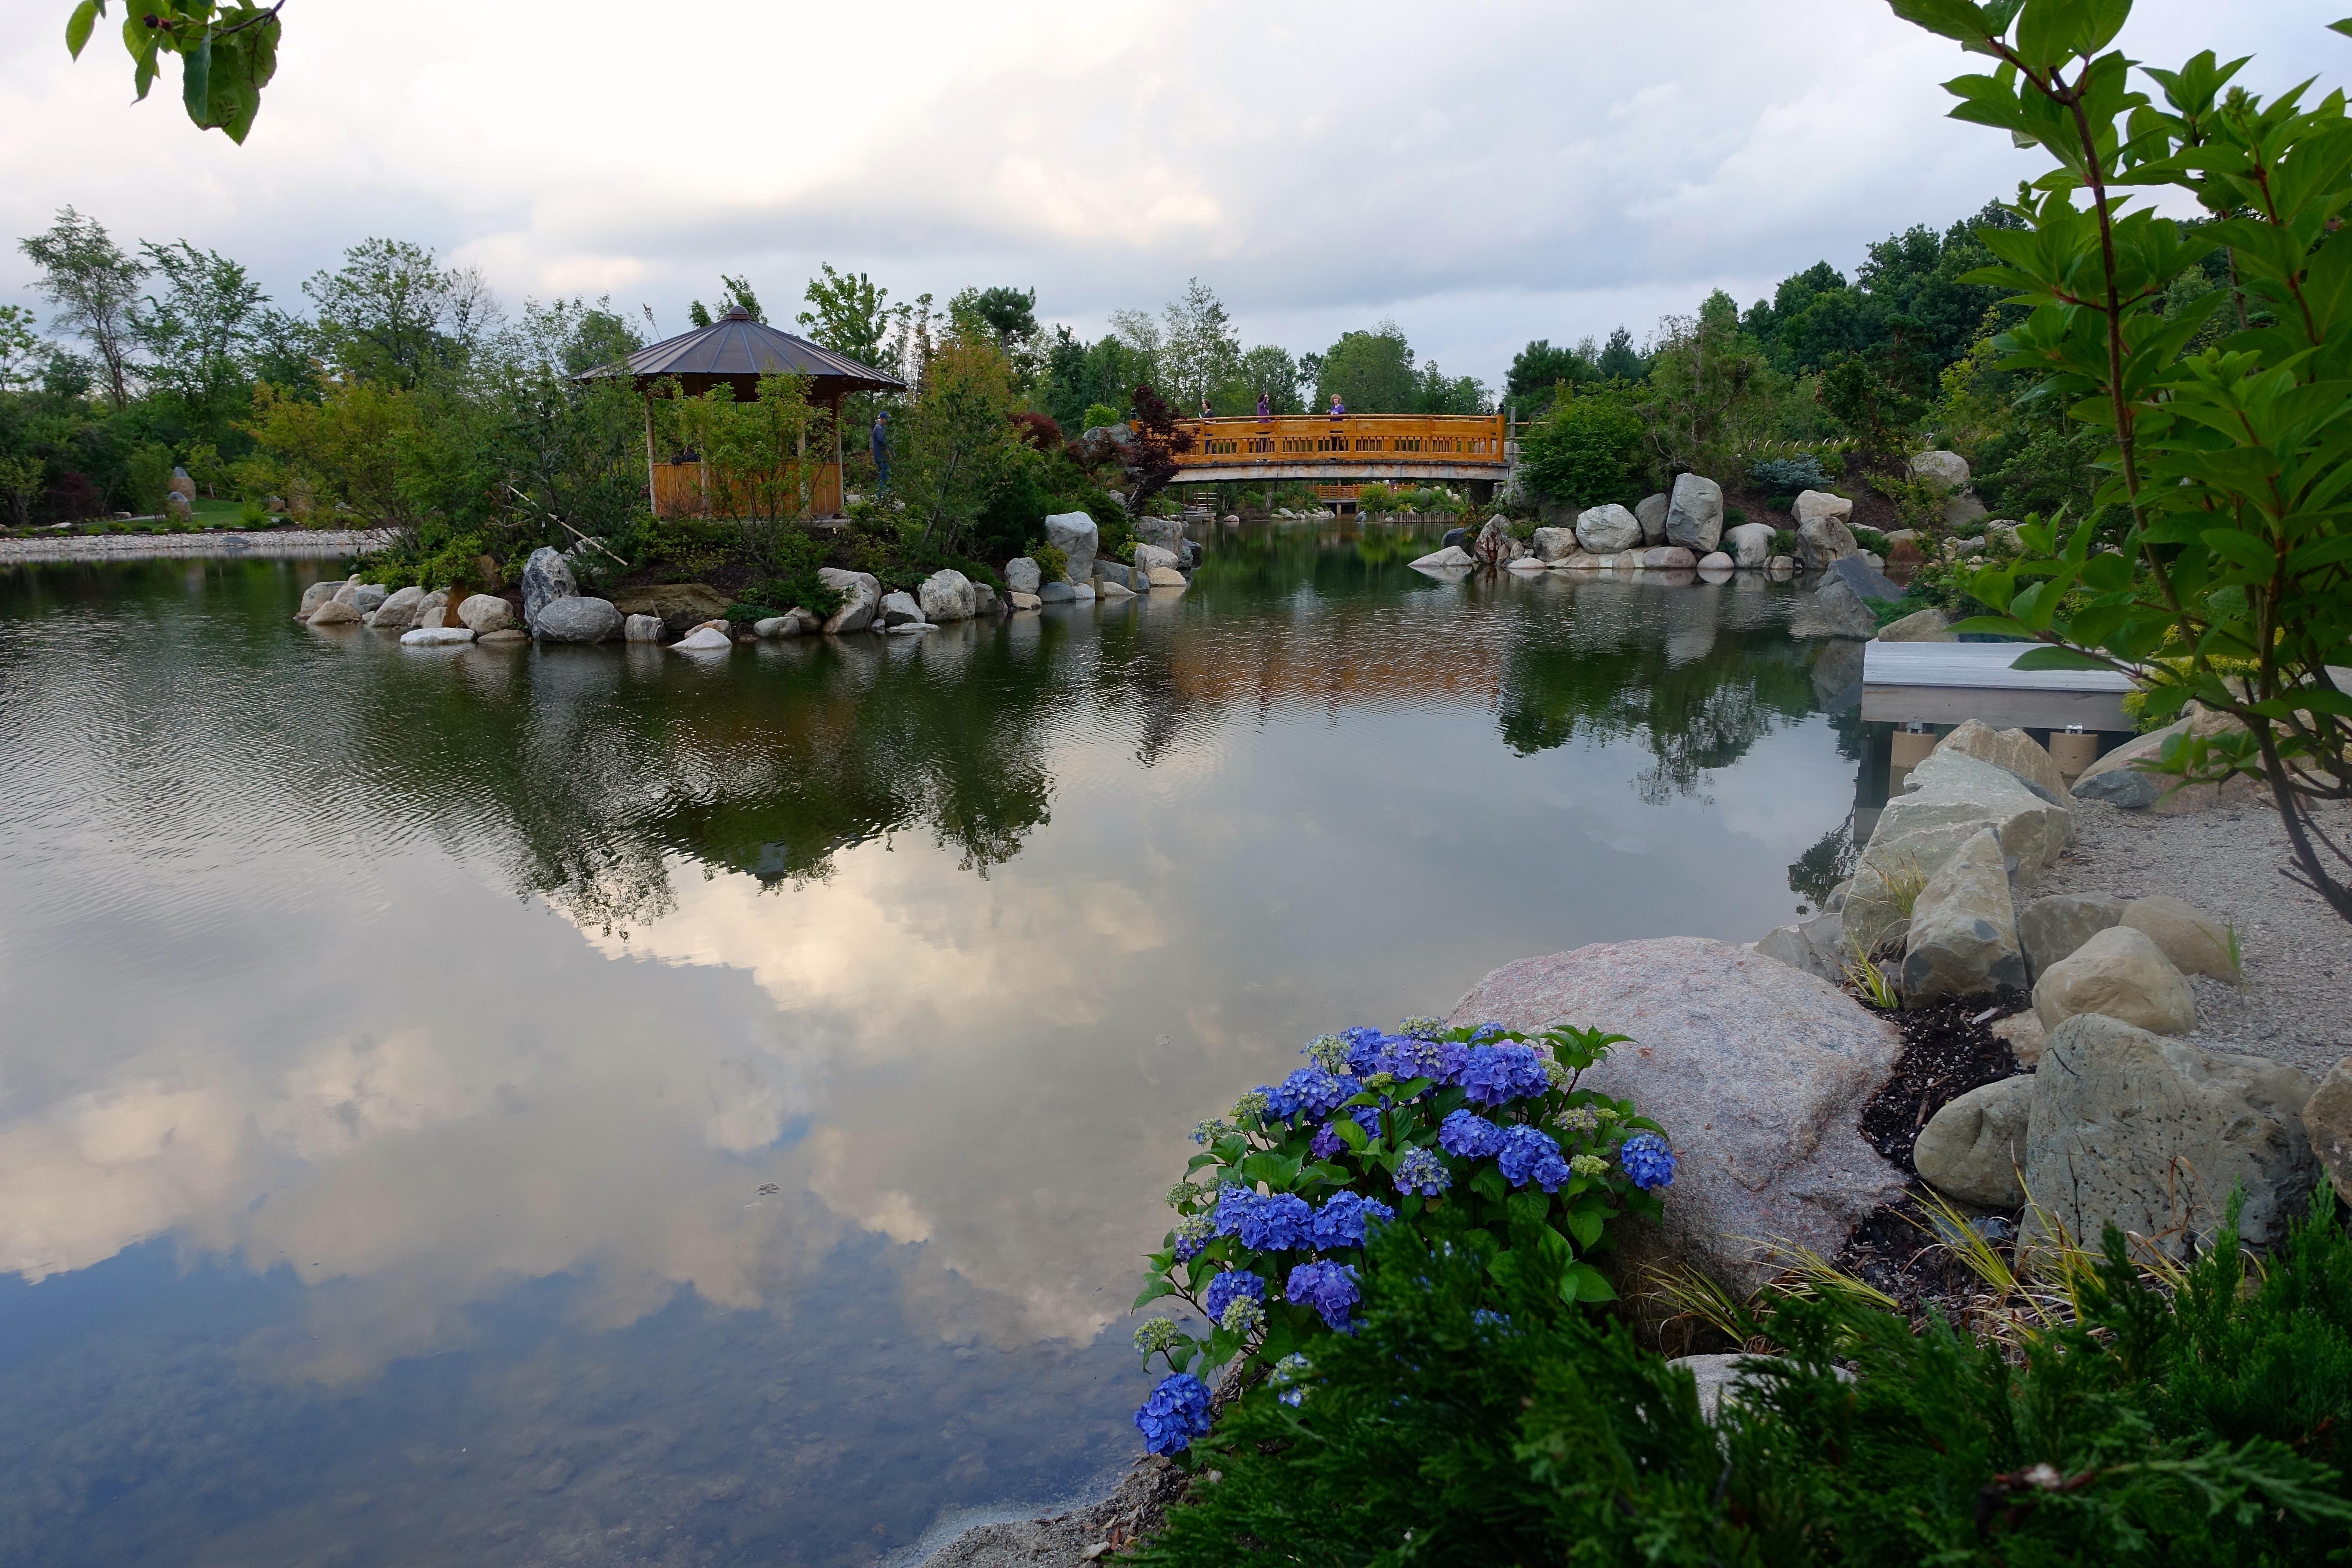 Frederik Meijer Japanese Garden